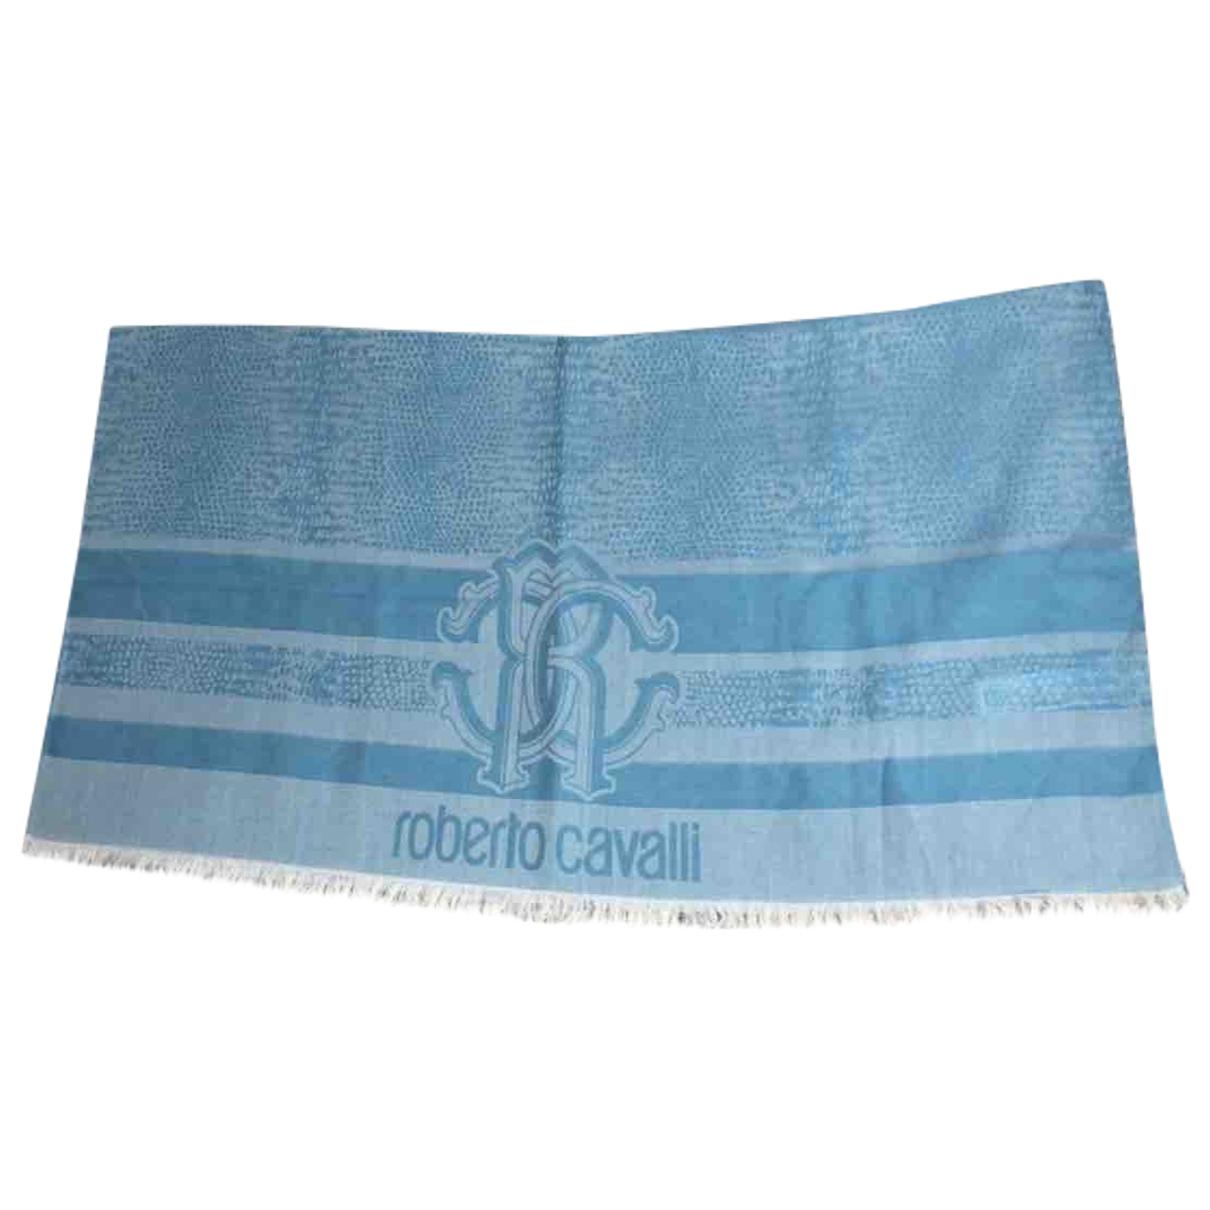 Roberto Cavalli - Foulard   pour femme en coton - bleu